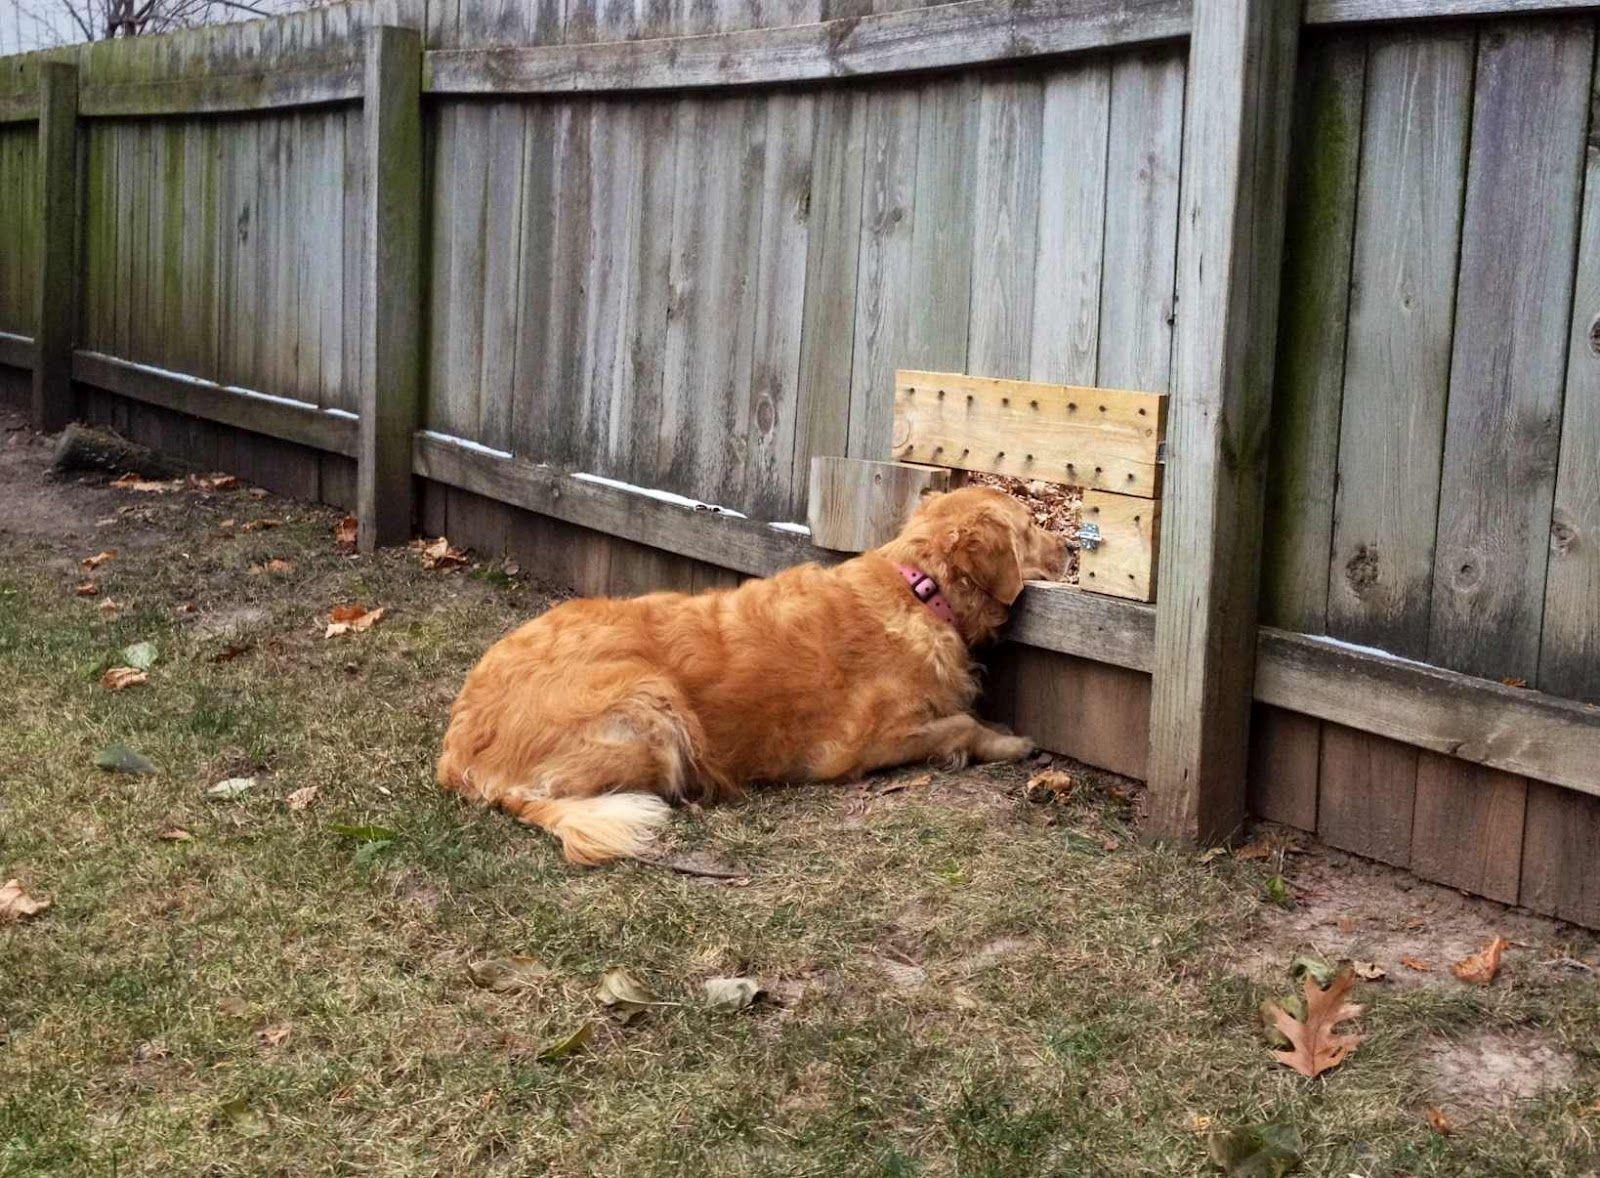 Backyard Dog Run Ideas dog run enrichment 3834455a9240619818ljpg Backyard Dog Run Ideas Backyard Landscaping With Dog Image Size Is 1600 X 1178 Pixel